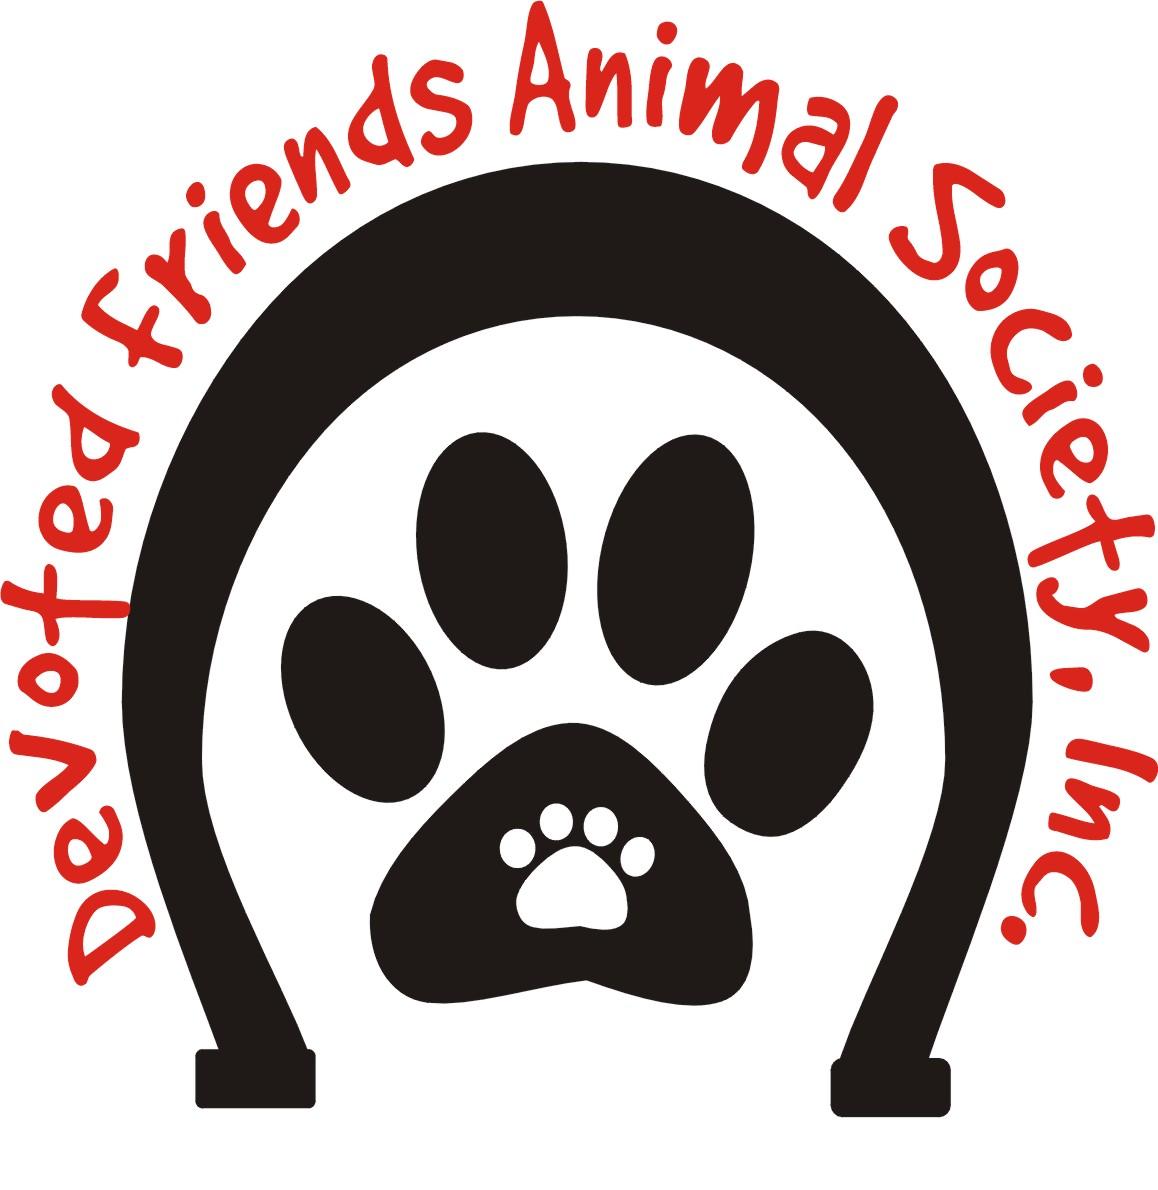 Devoted Friends Animal Society, Inc.